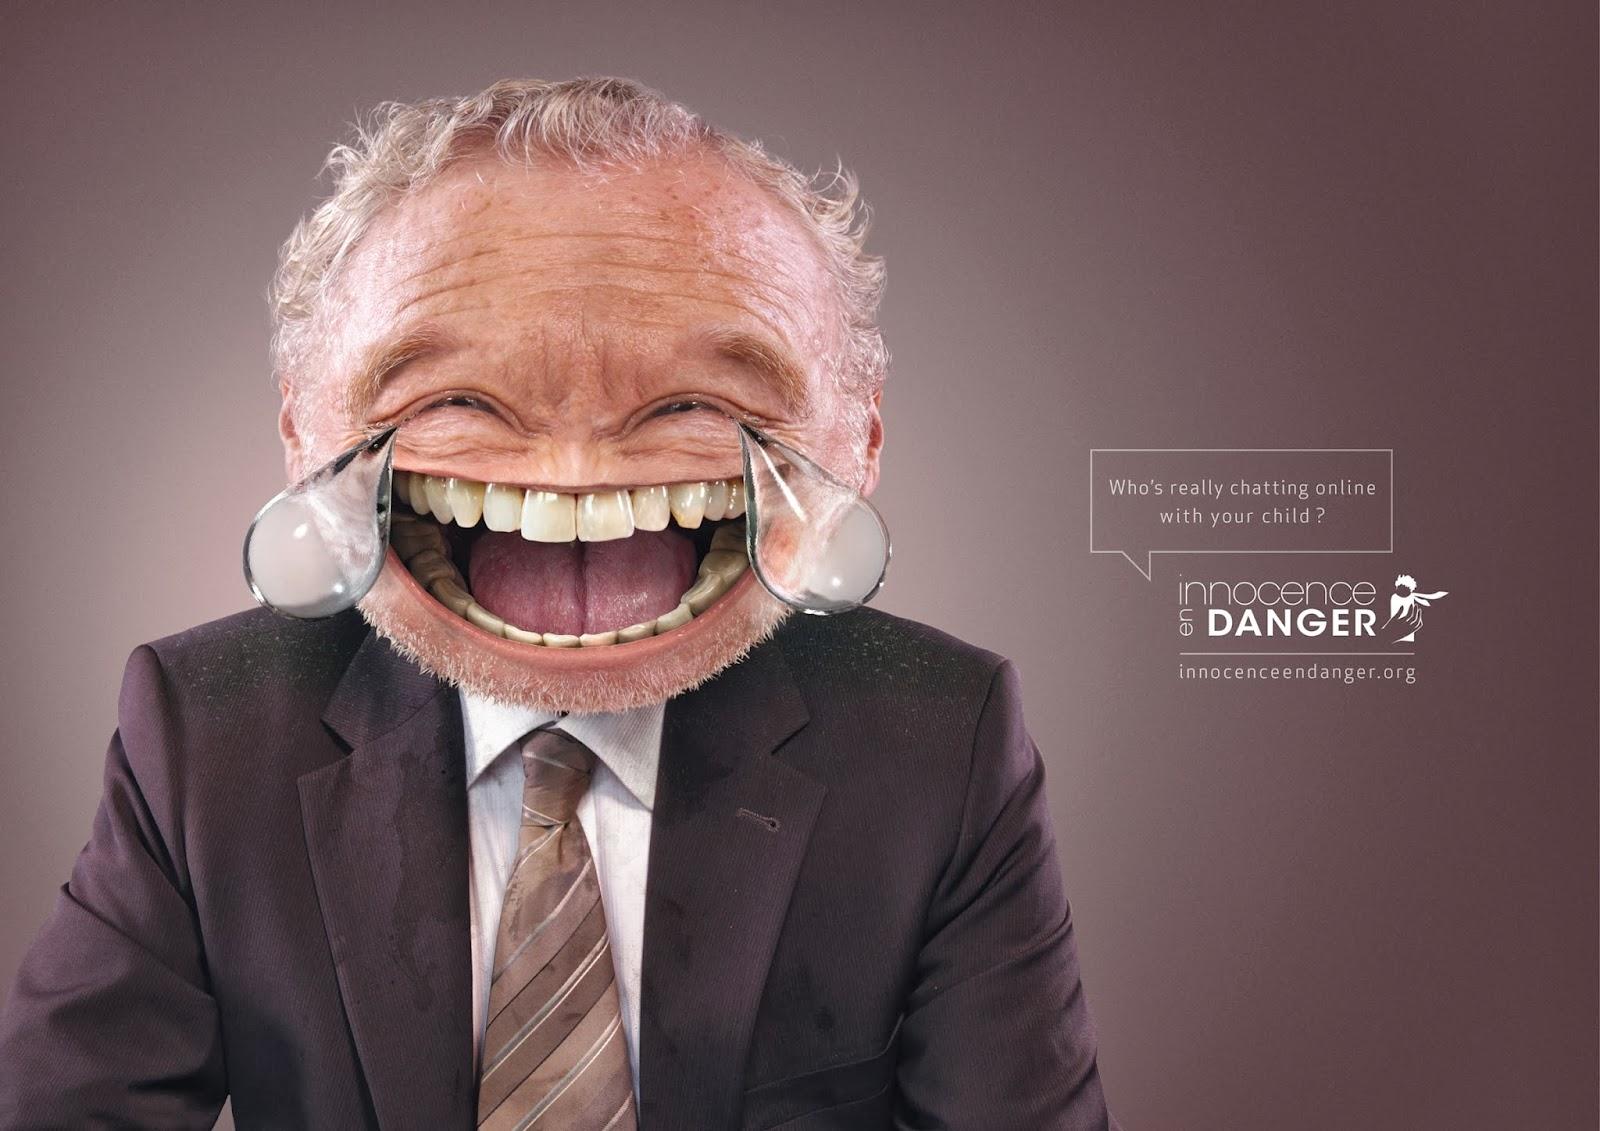 Innocence en Danger Emoticons campaign,